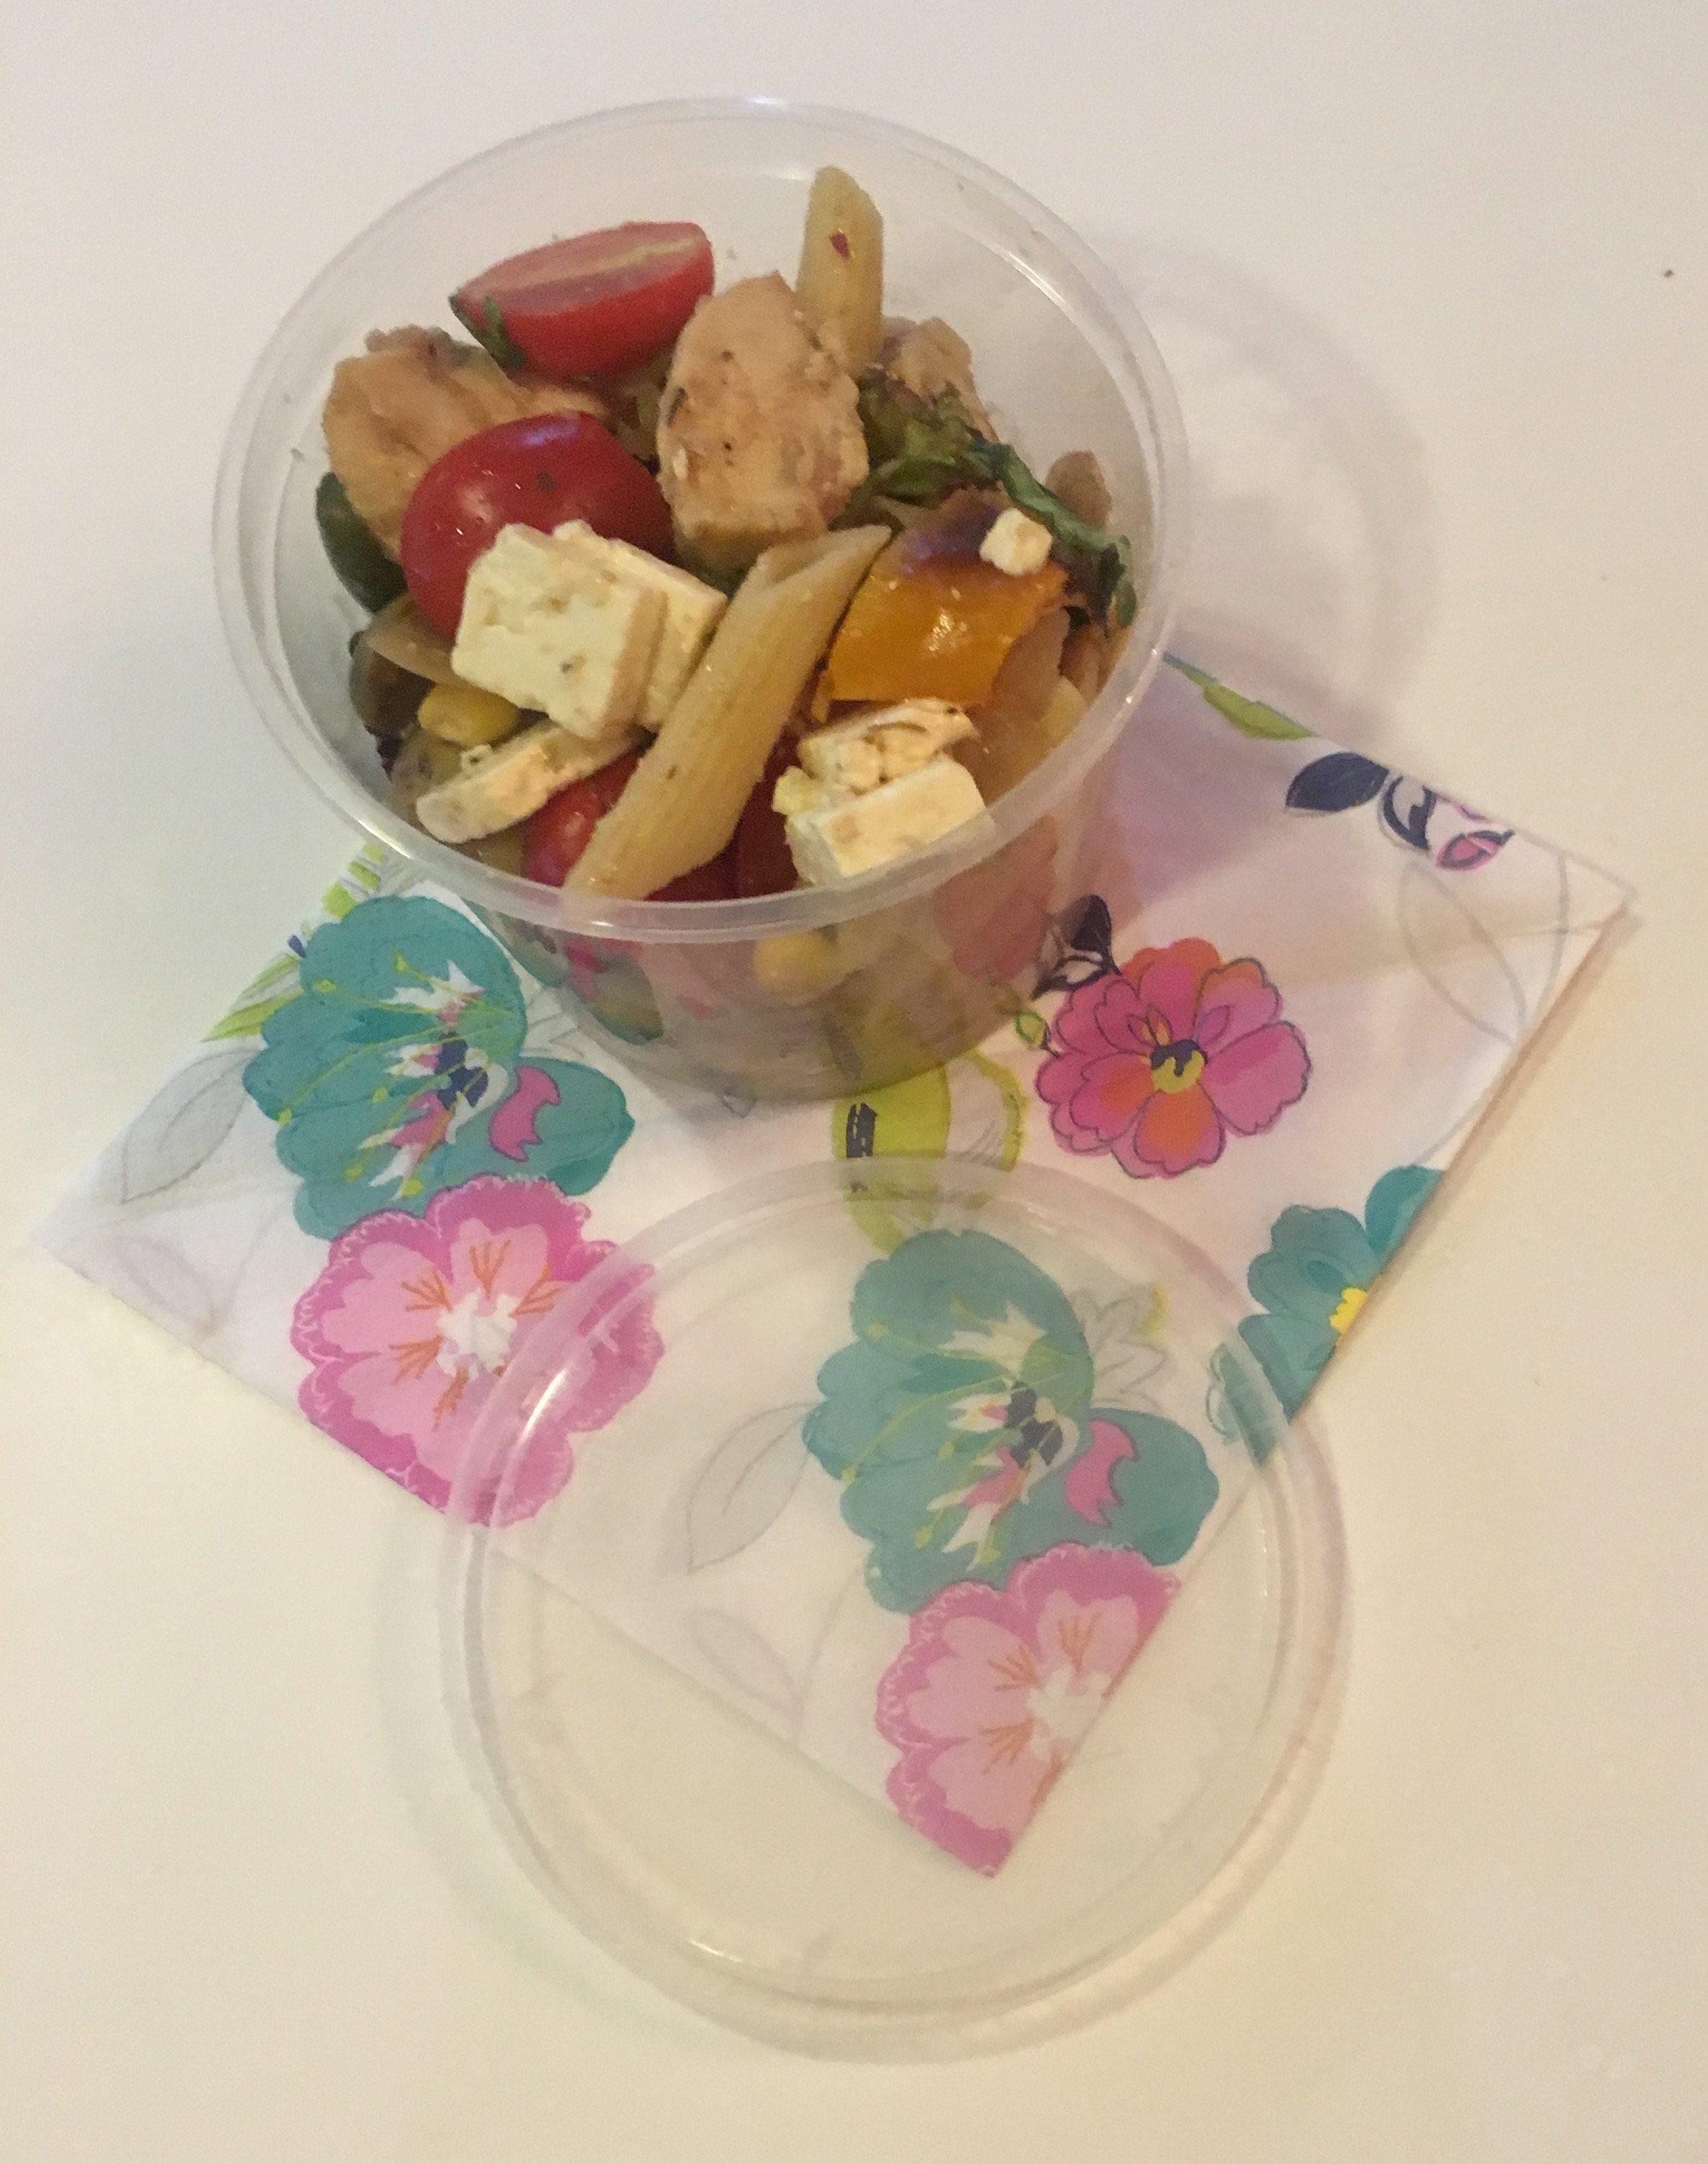 low FODMAP pasta salad